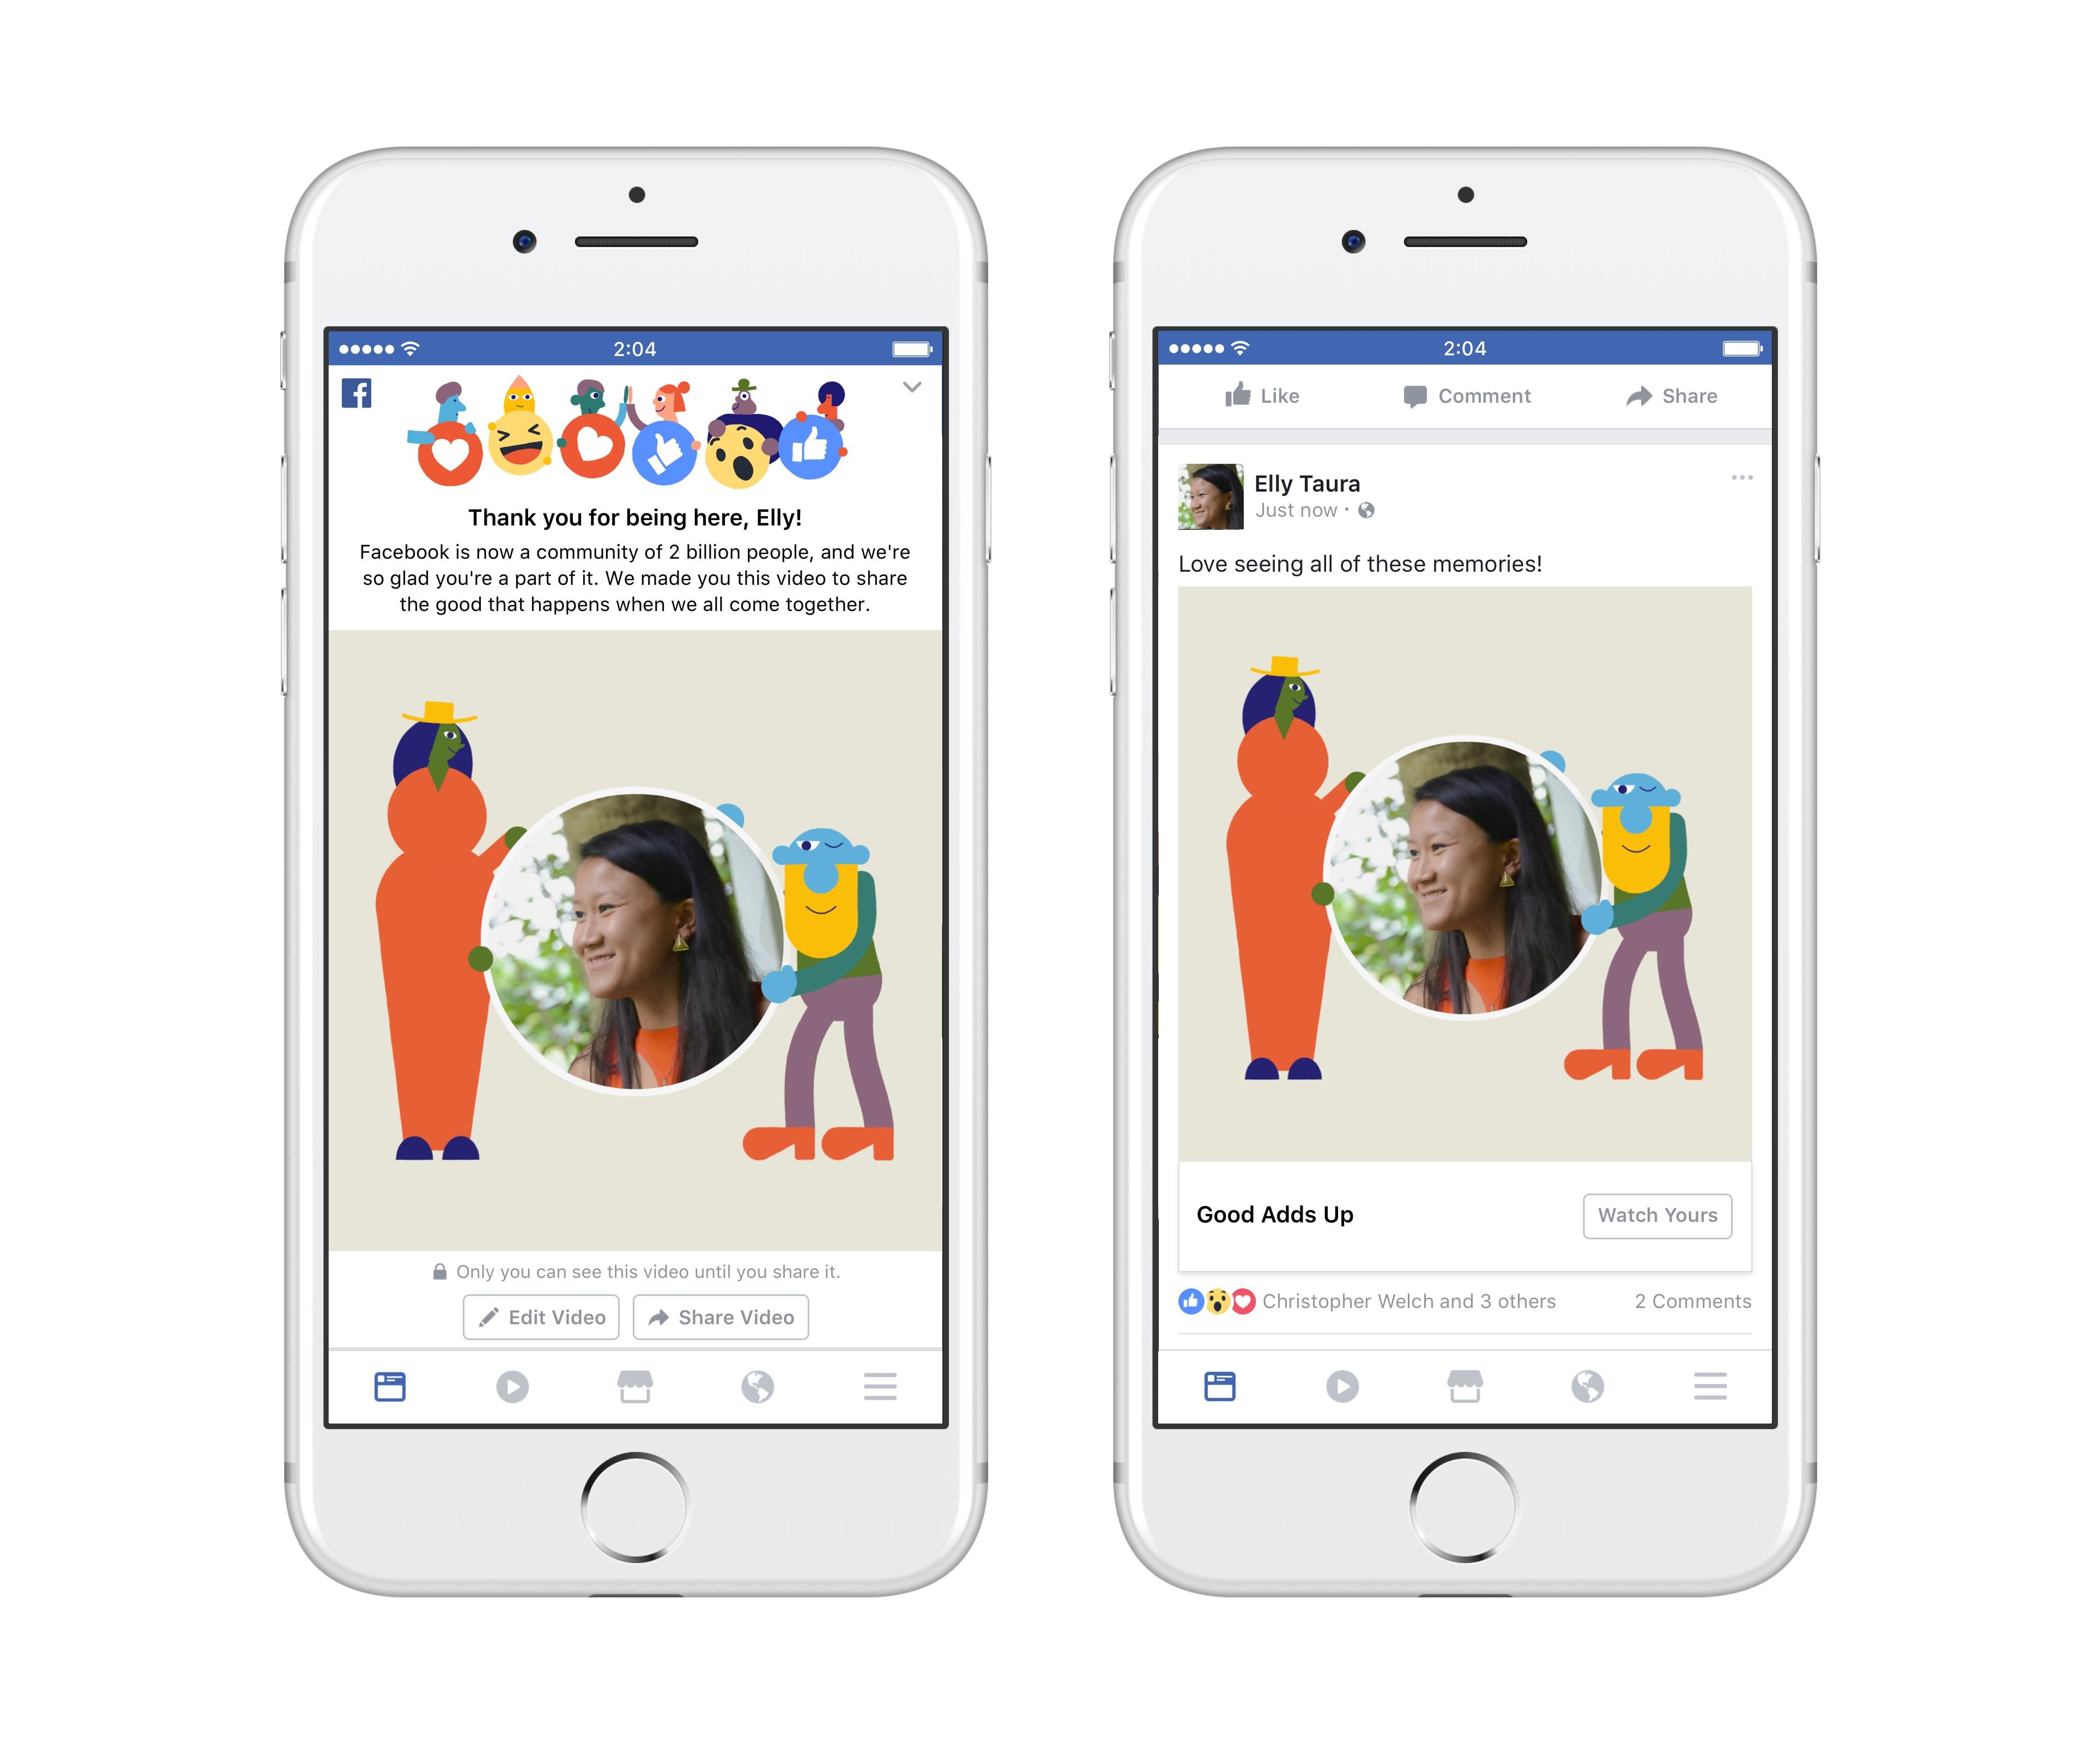 facebook-2-miliardi-1